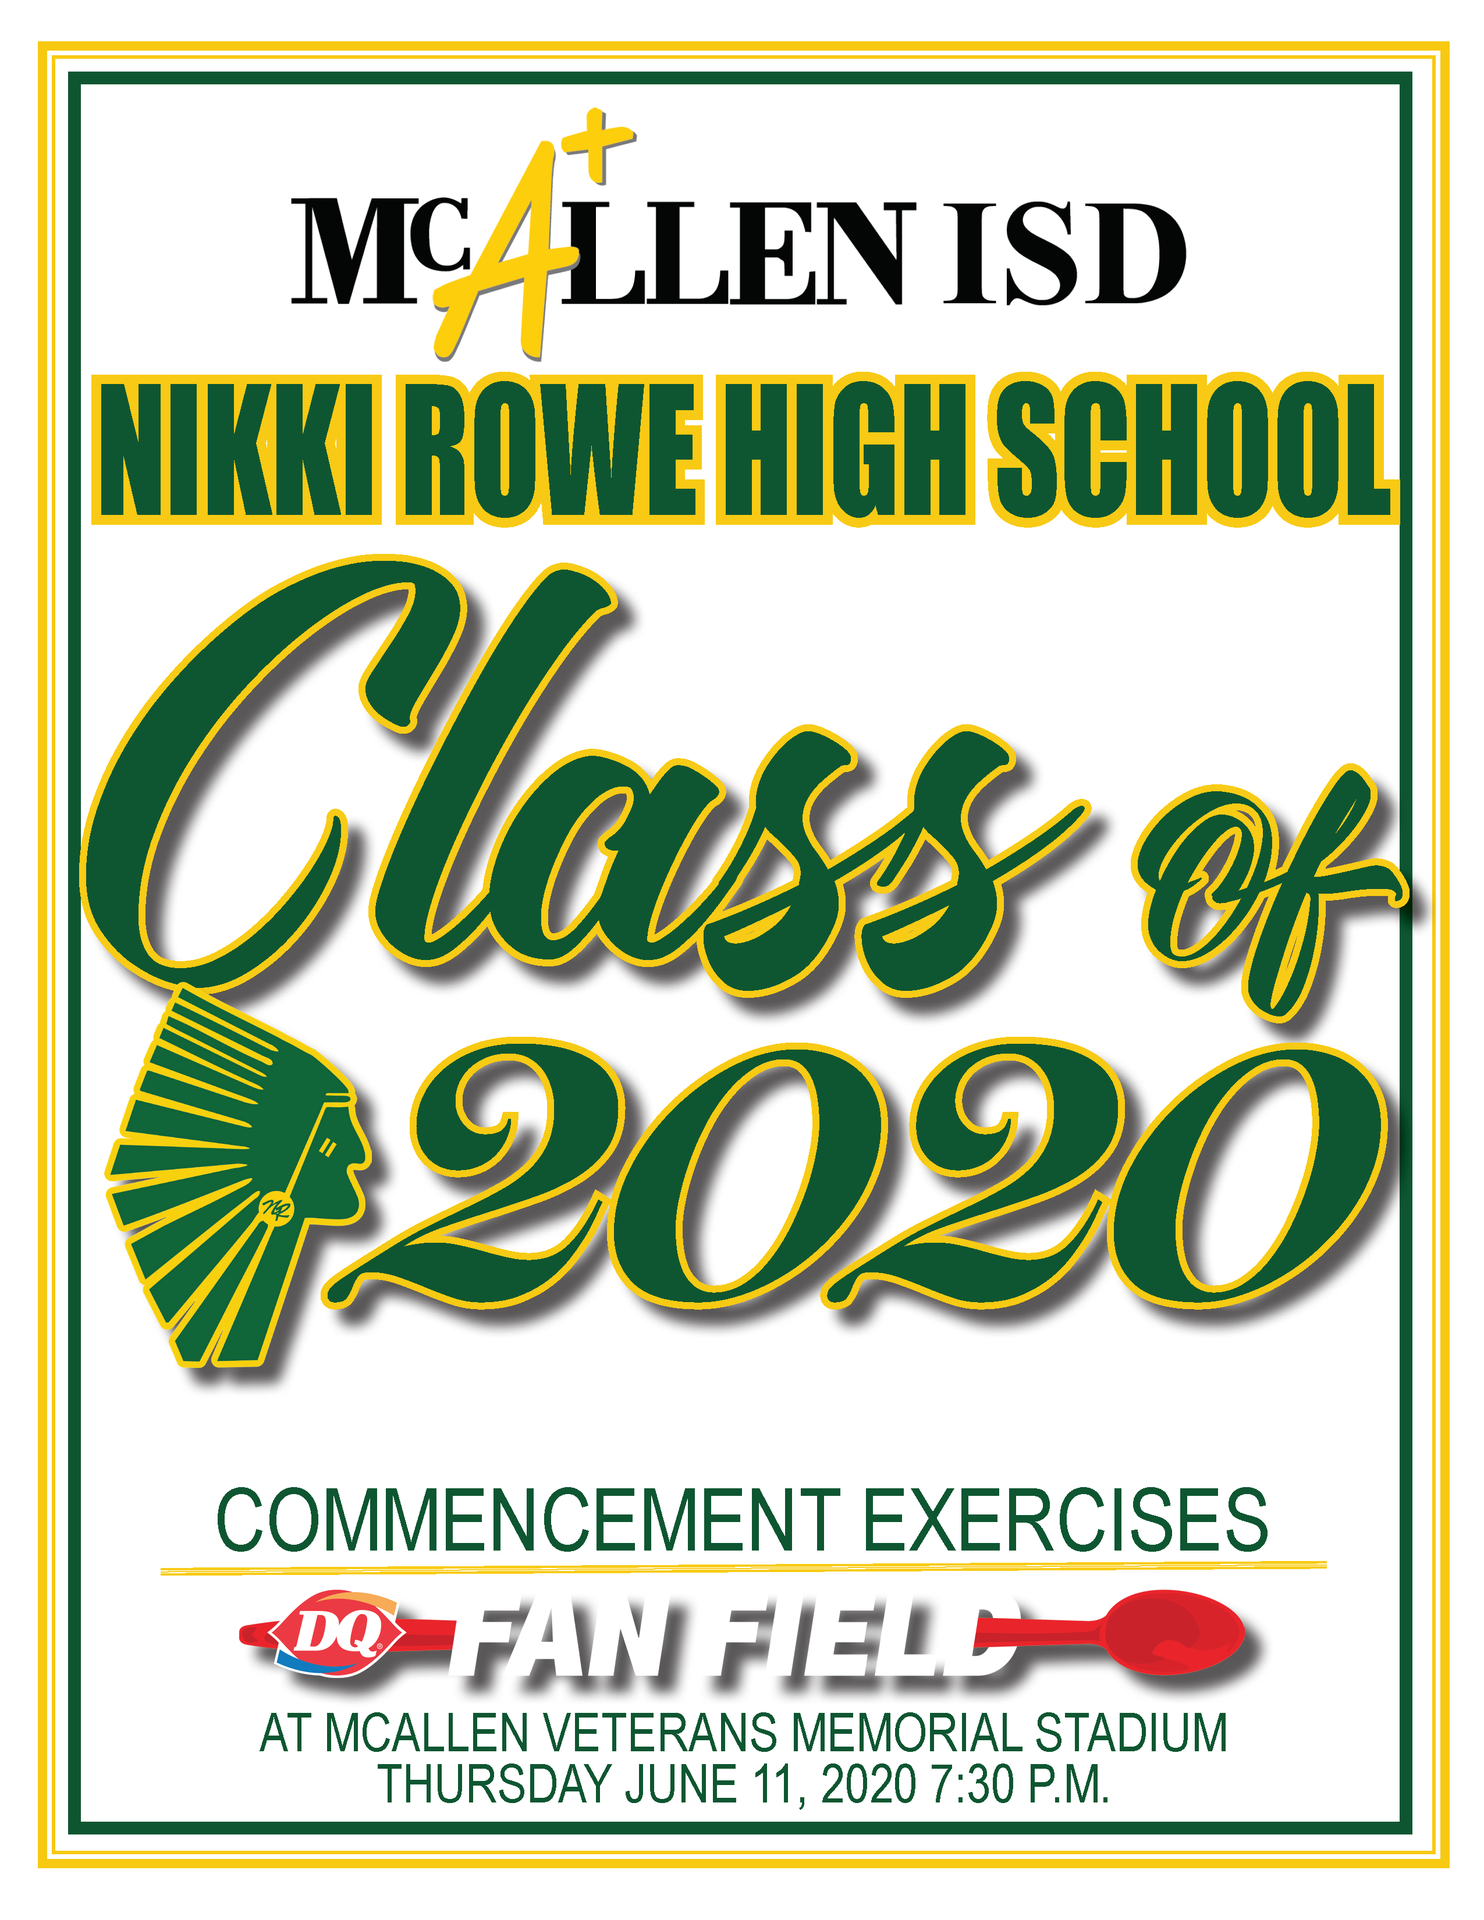 Nikki Rowe High School Graduation